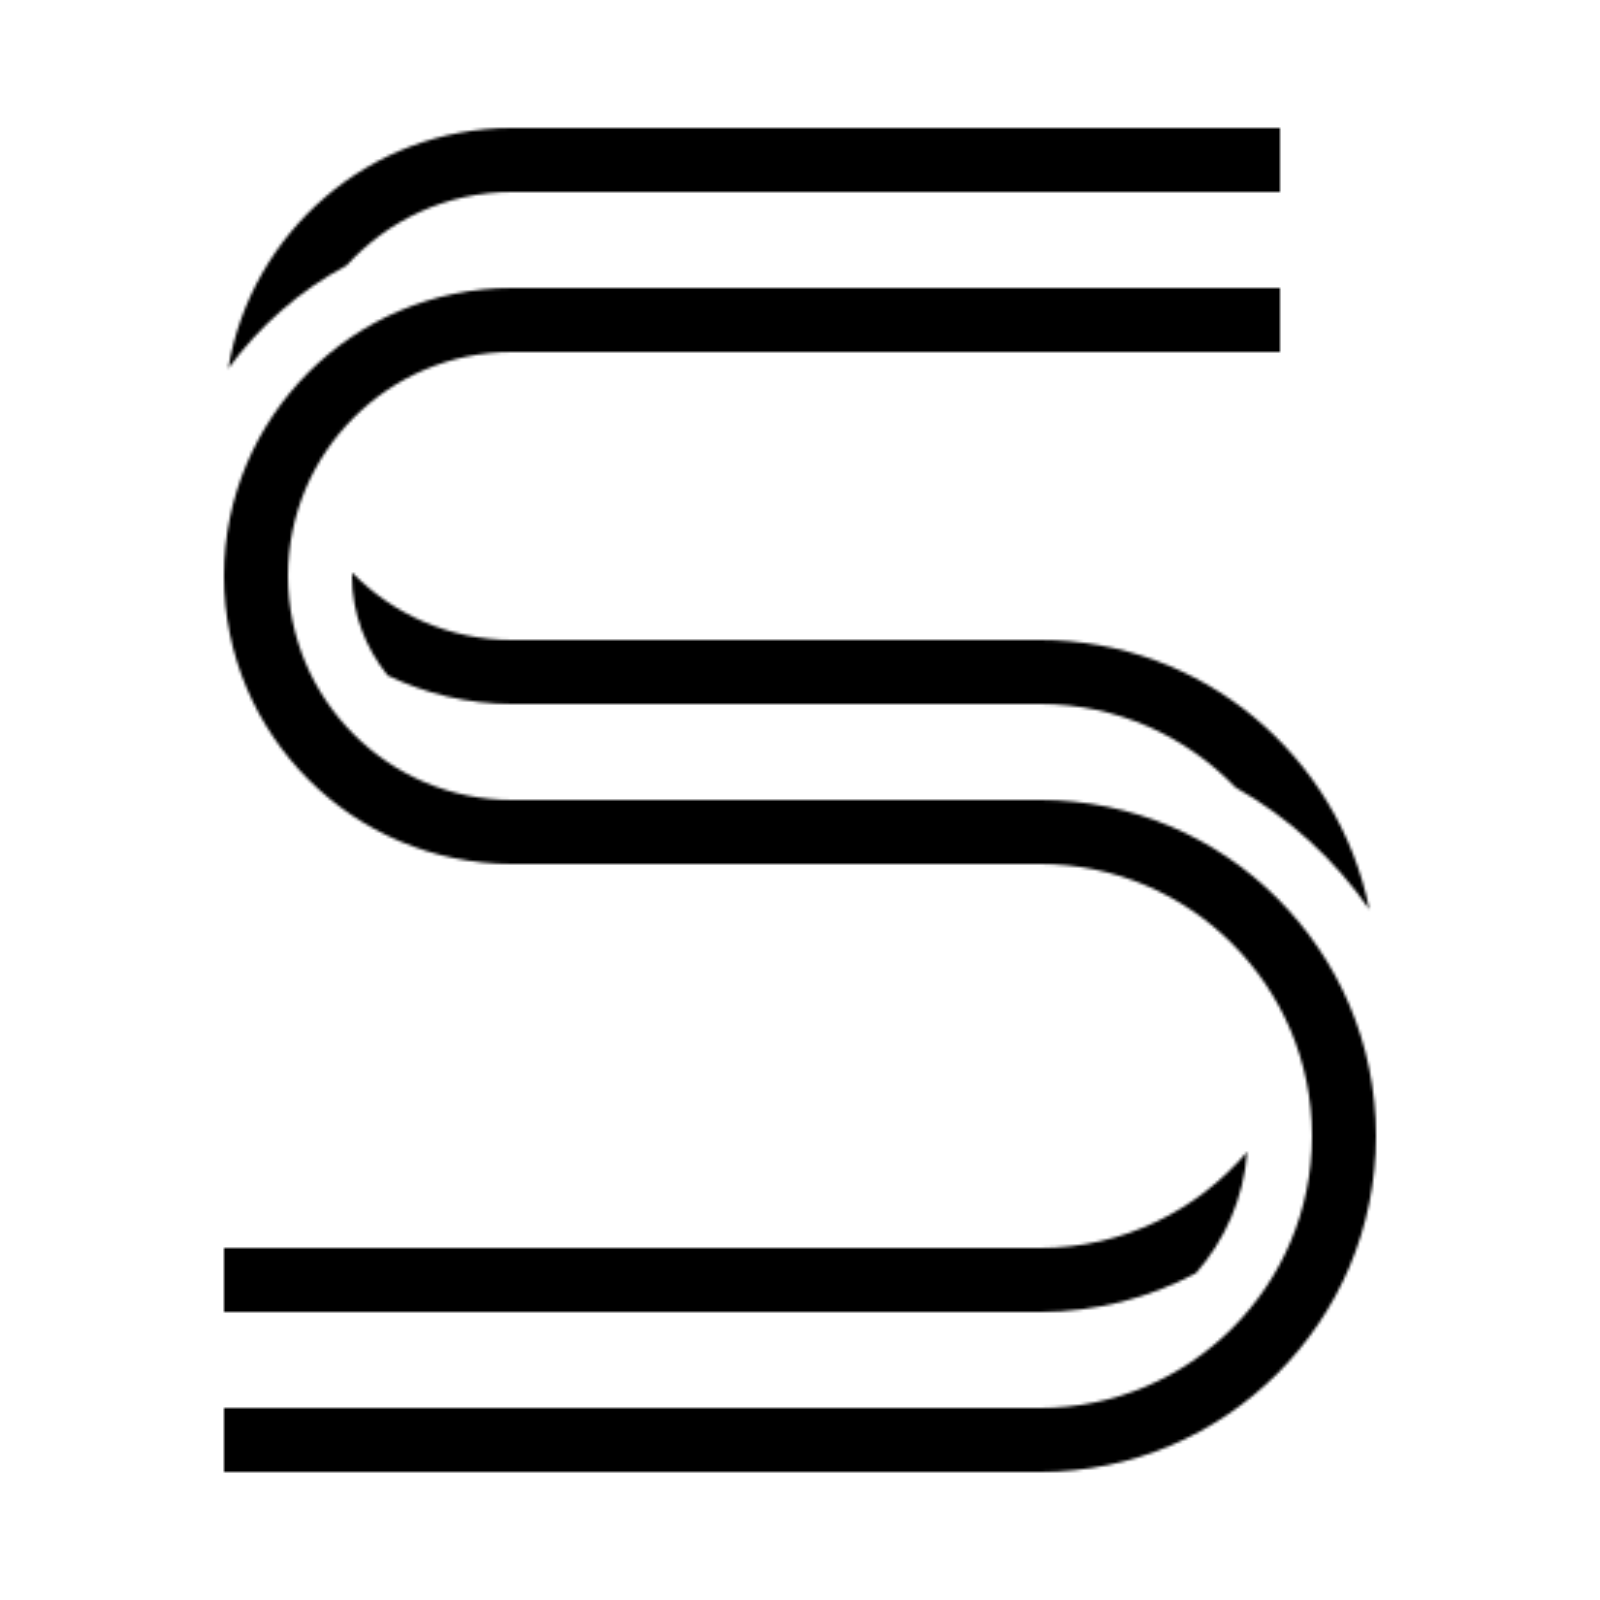 S Symbol icon